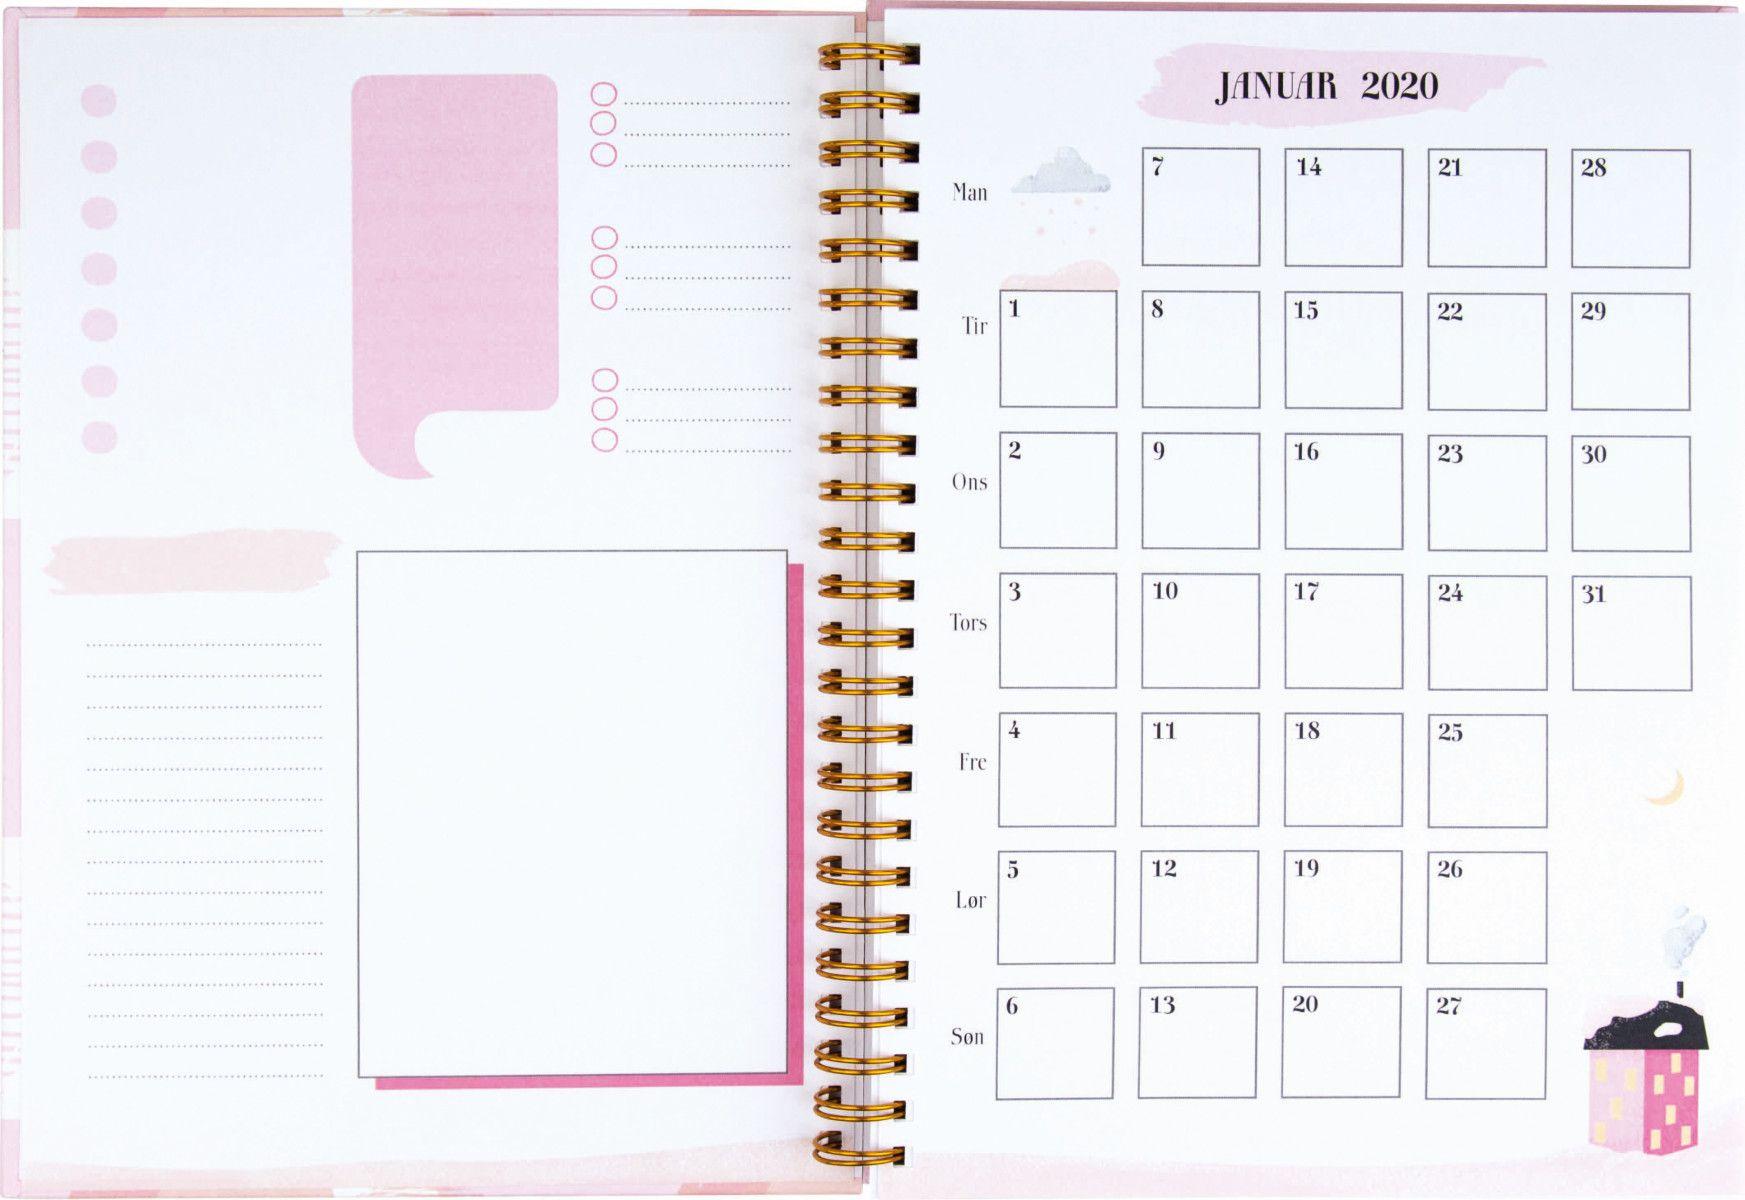 Ukekalender Grieg A5 Lifeplanner Rosa 2020 with Norsk Ukekalender 2020